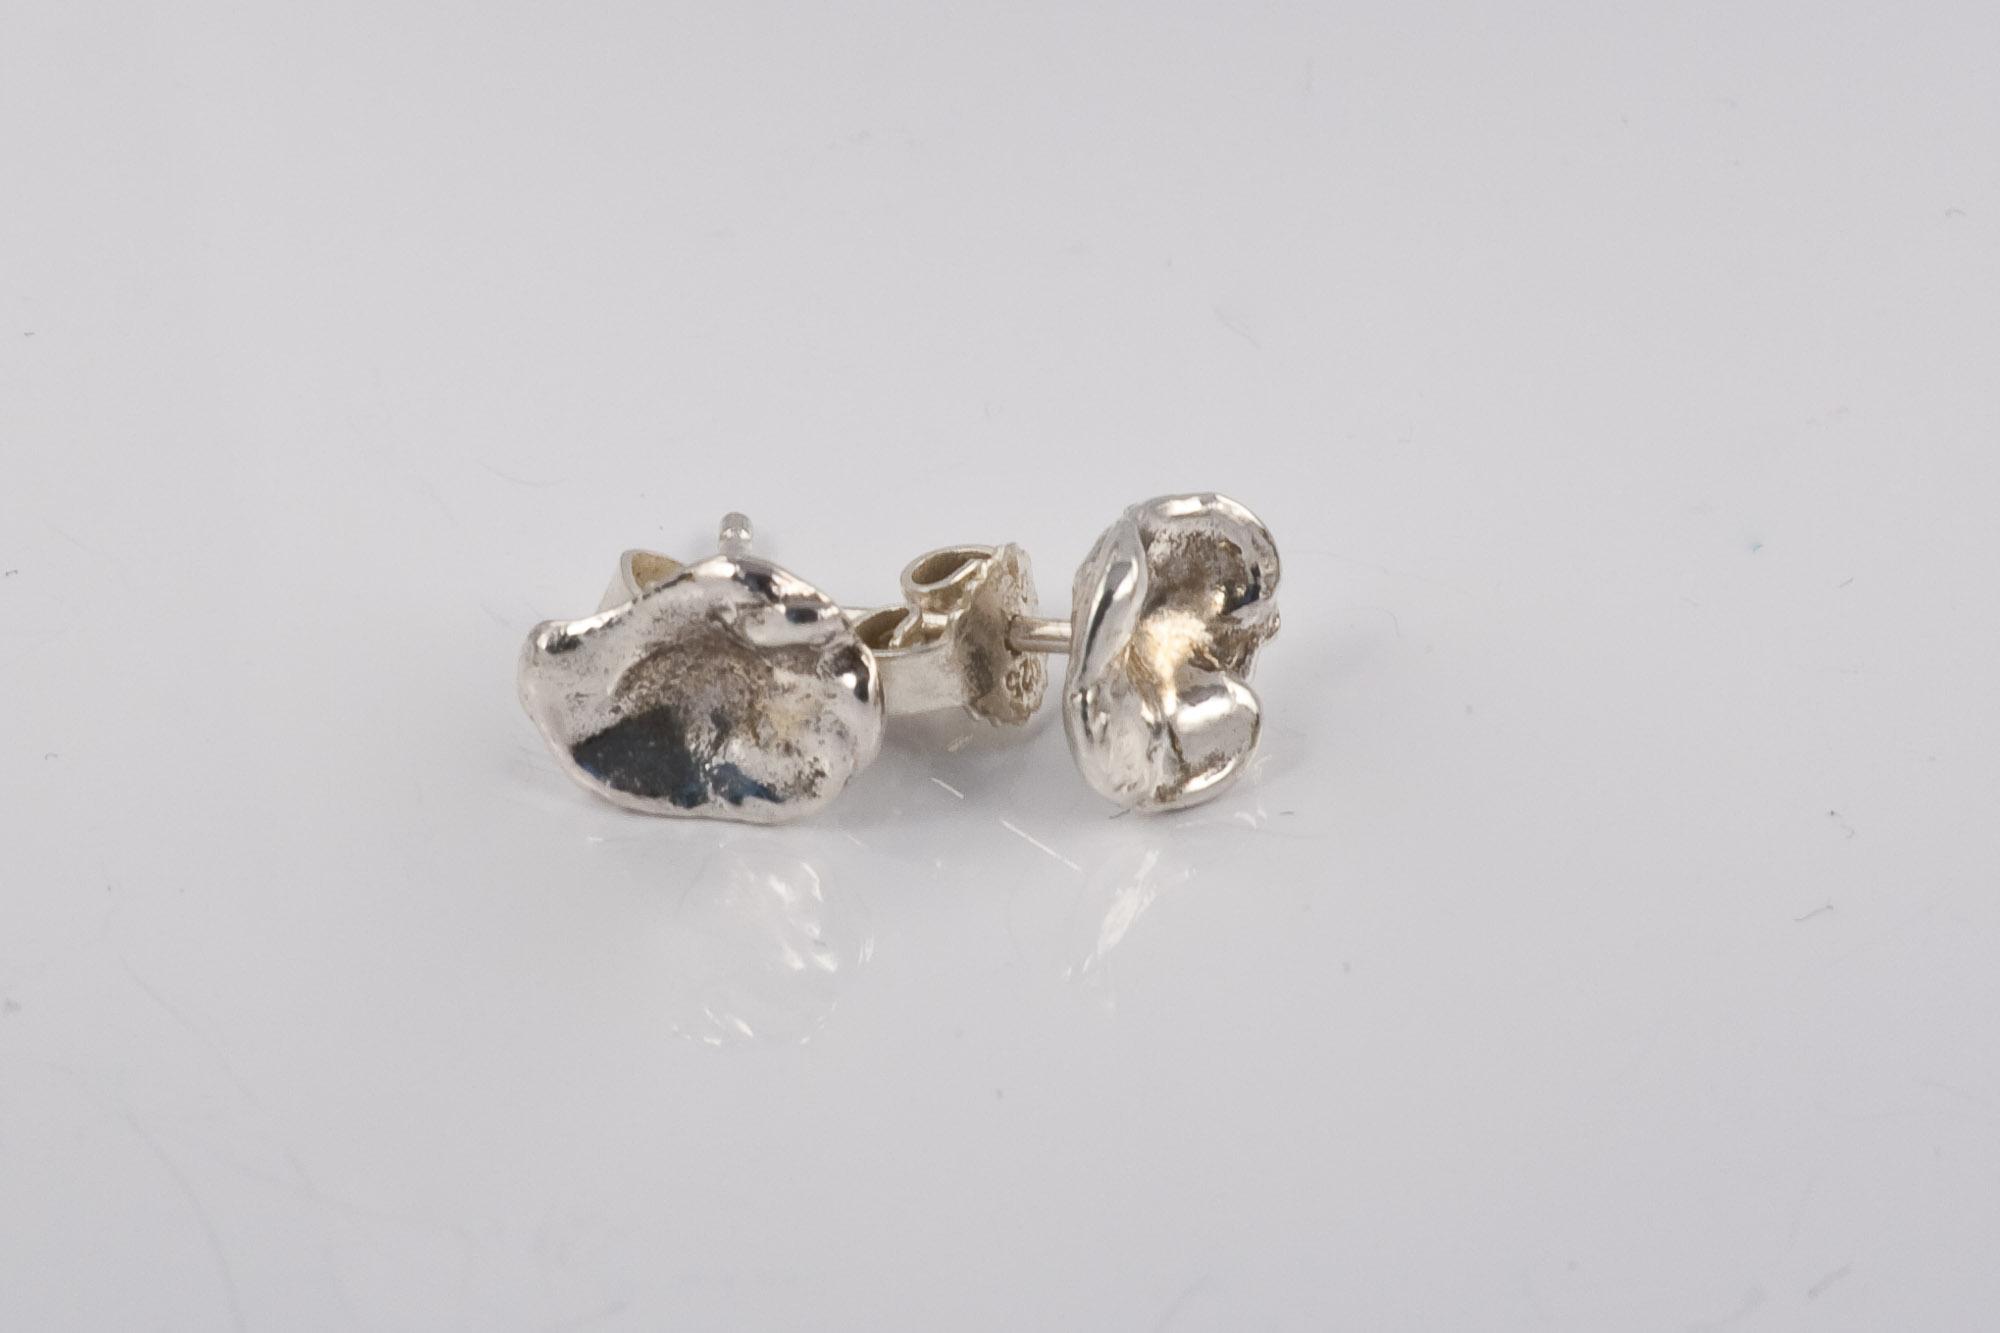 Kr. 475. Blomster-øreringe. Unika